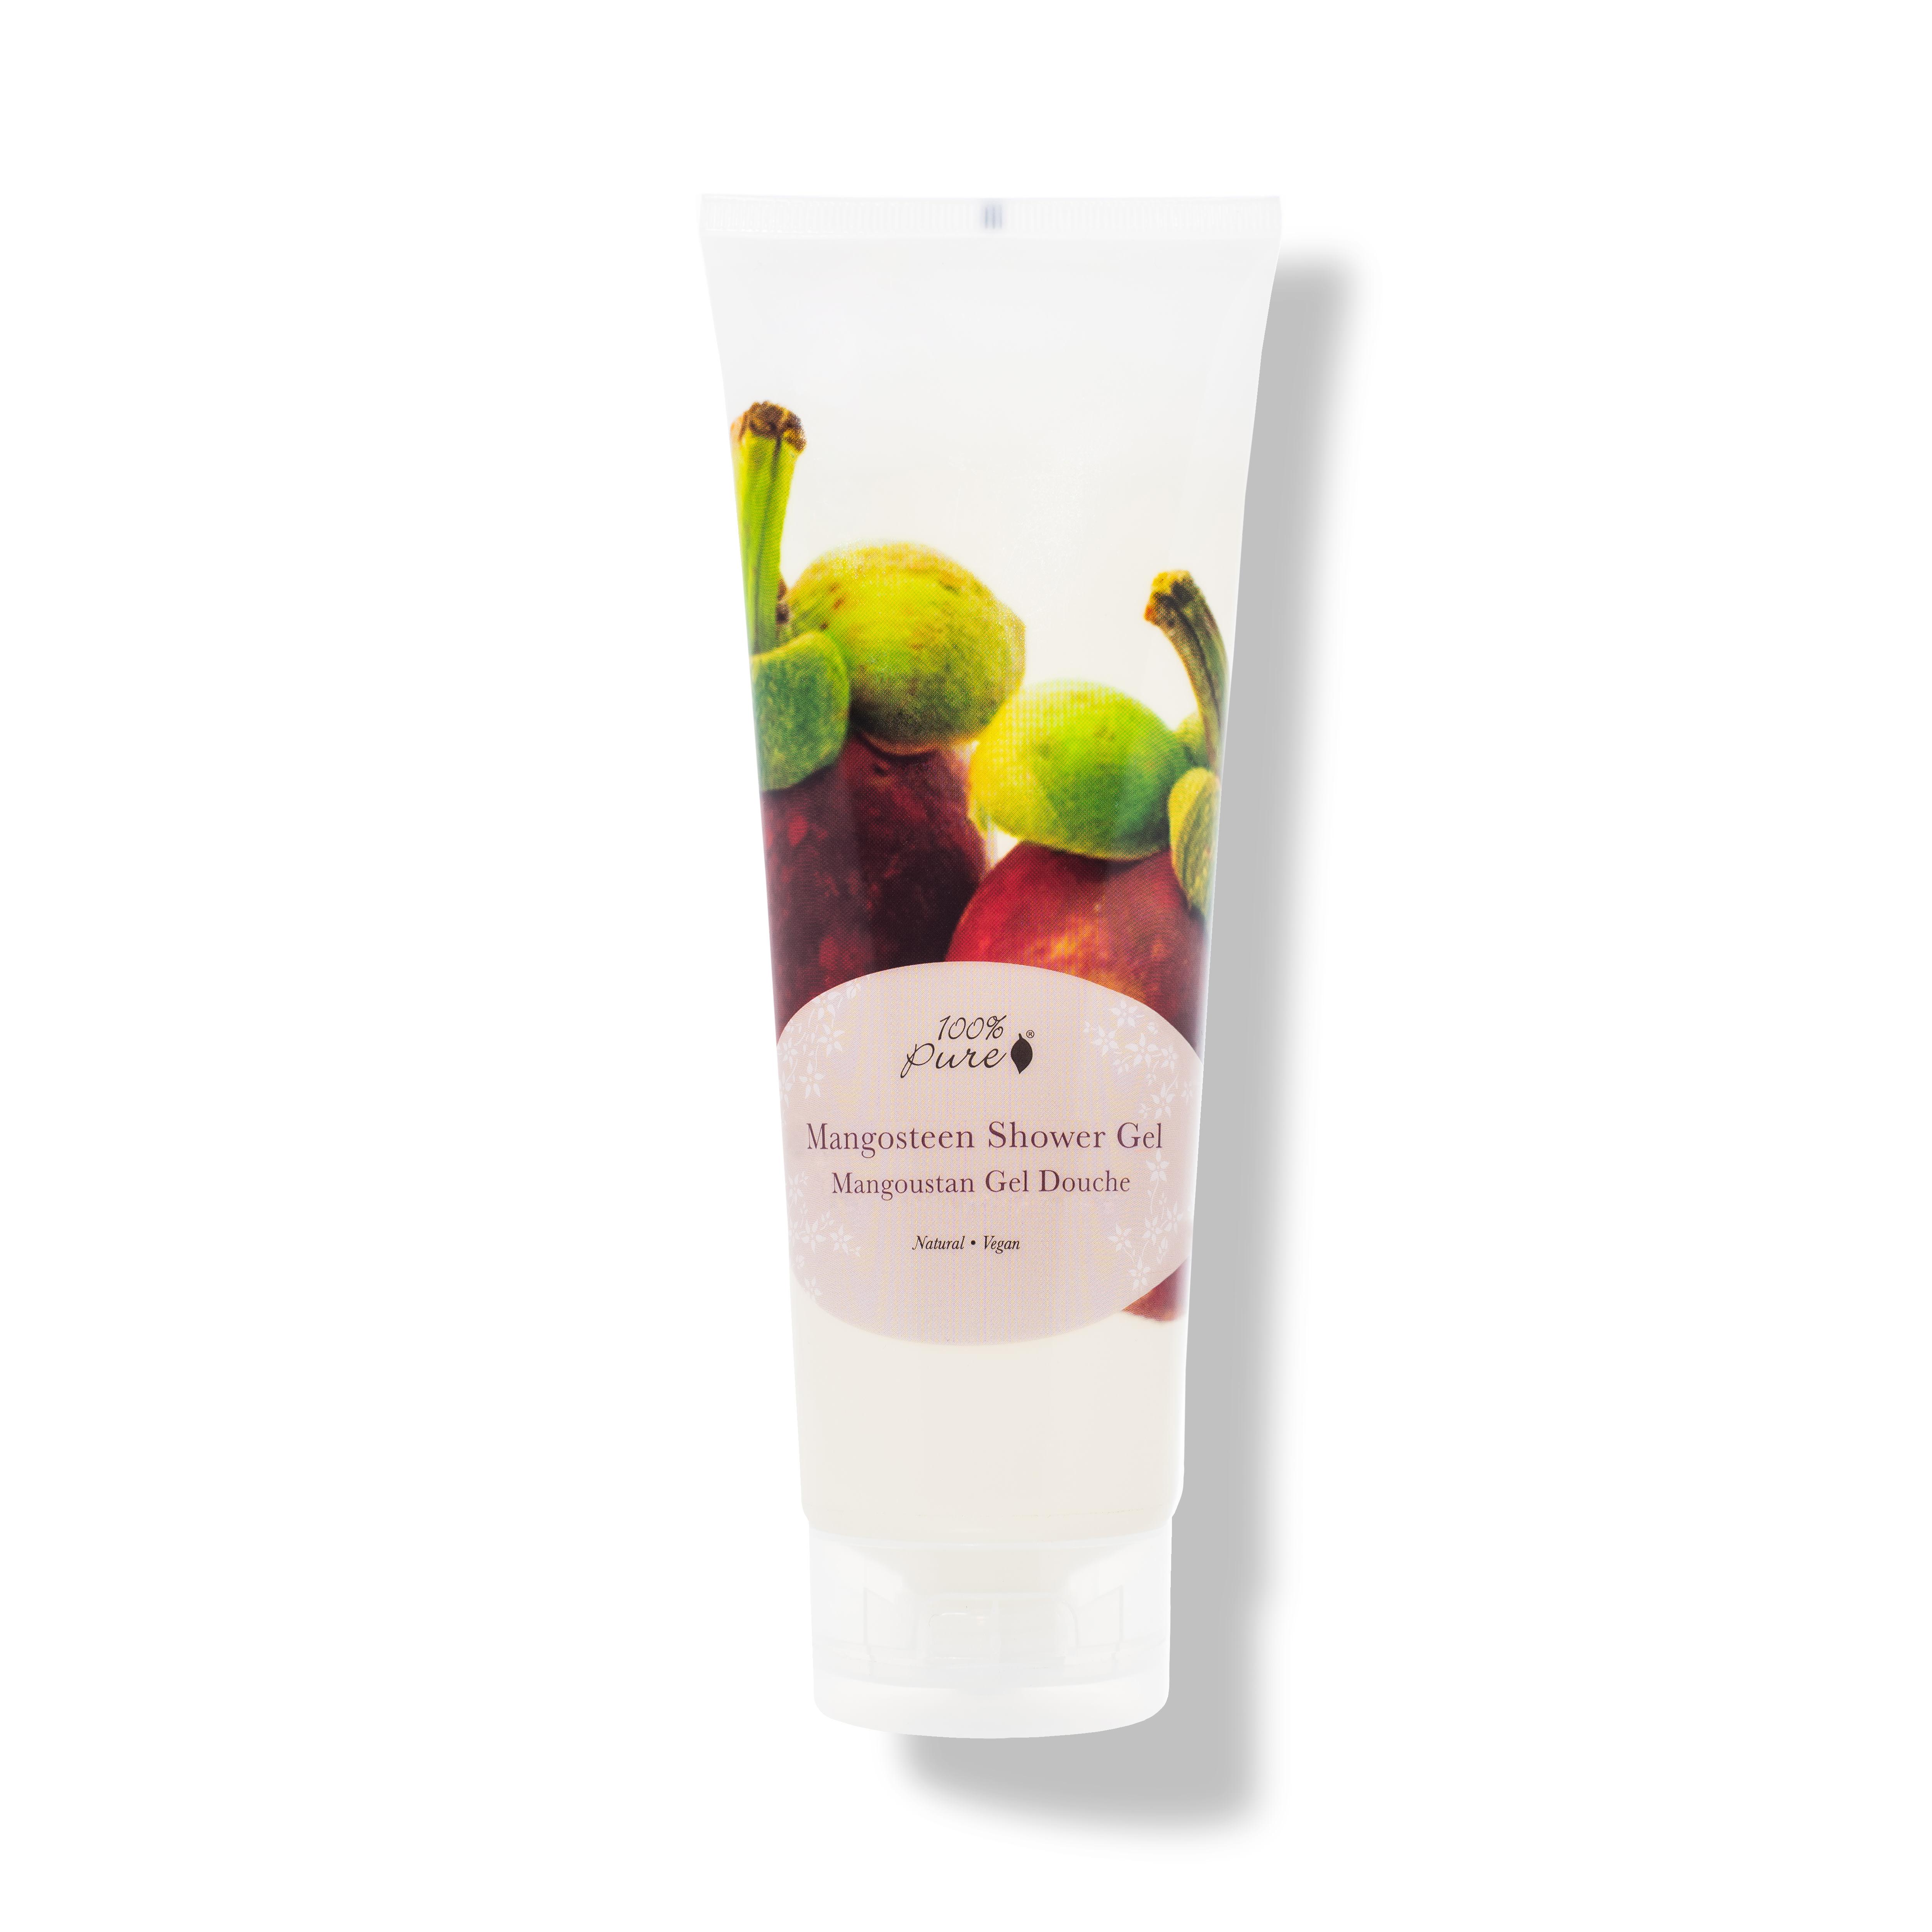 Product Grid - Mangosteen Shower Gel